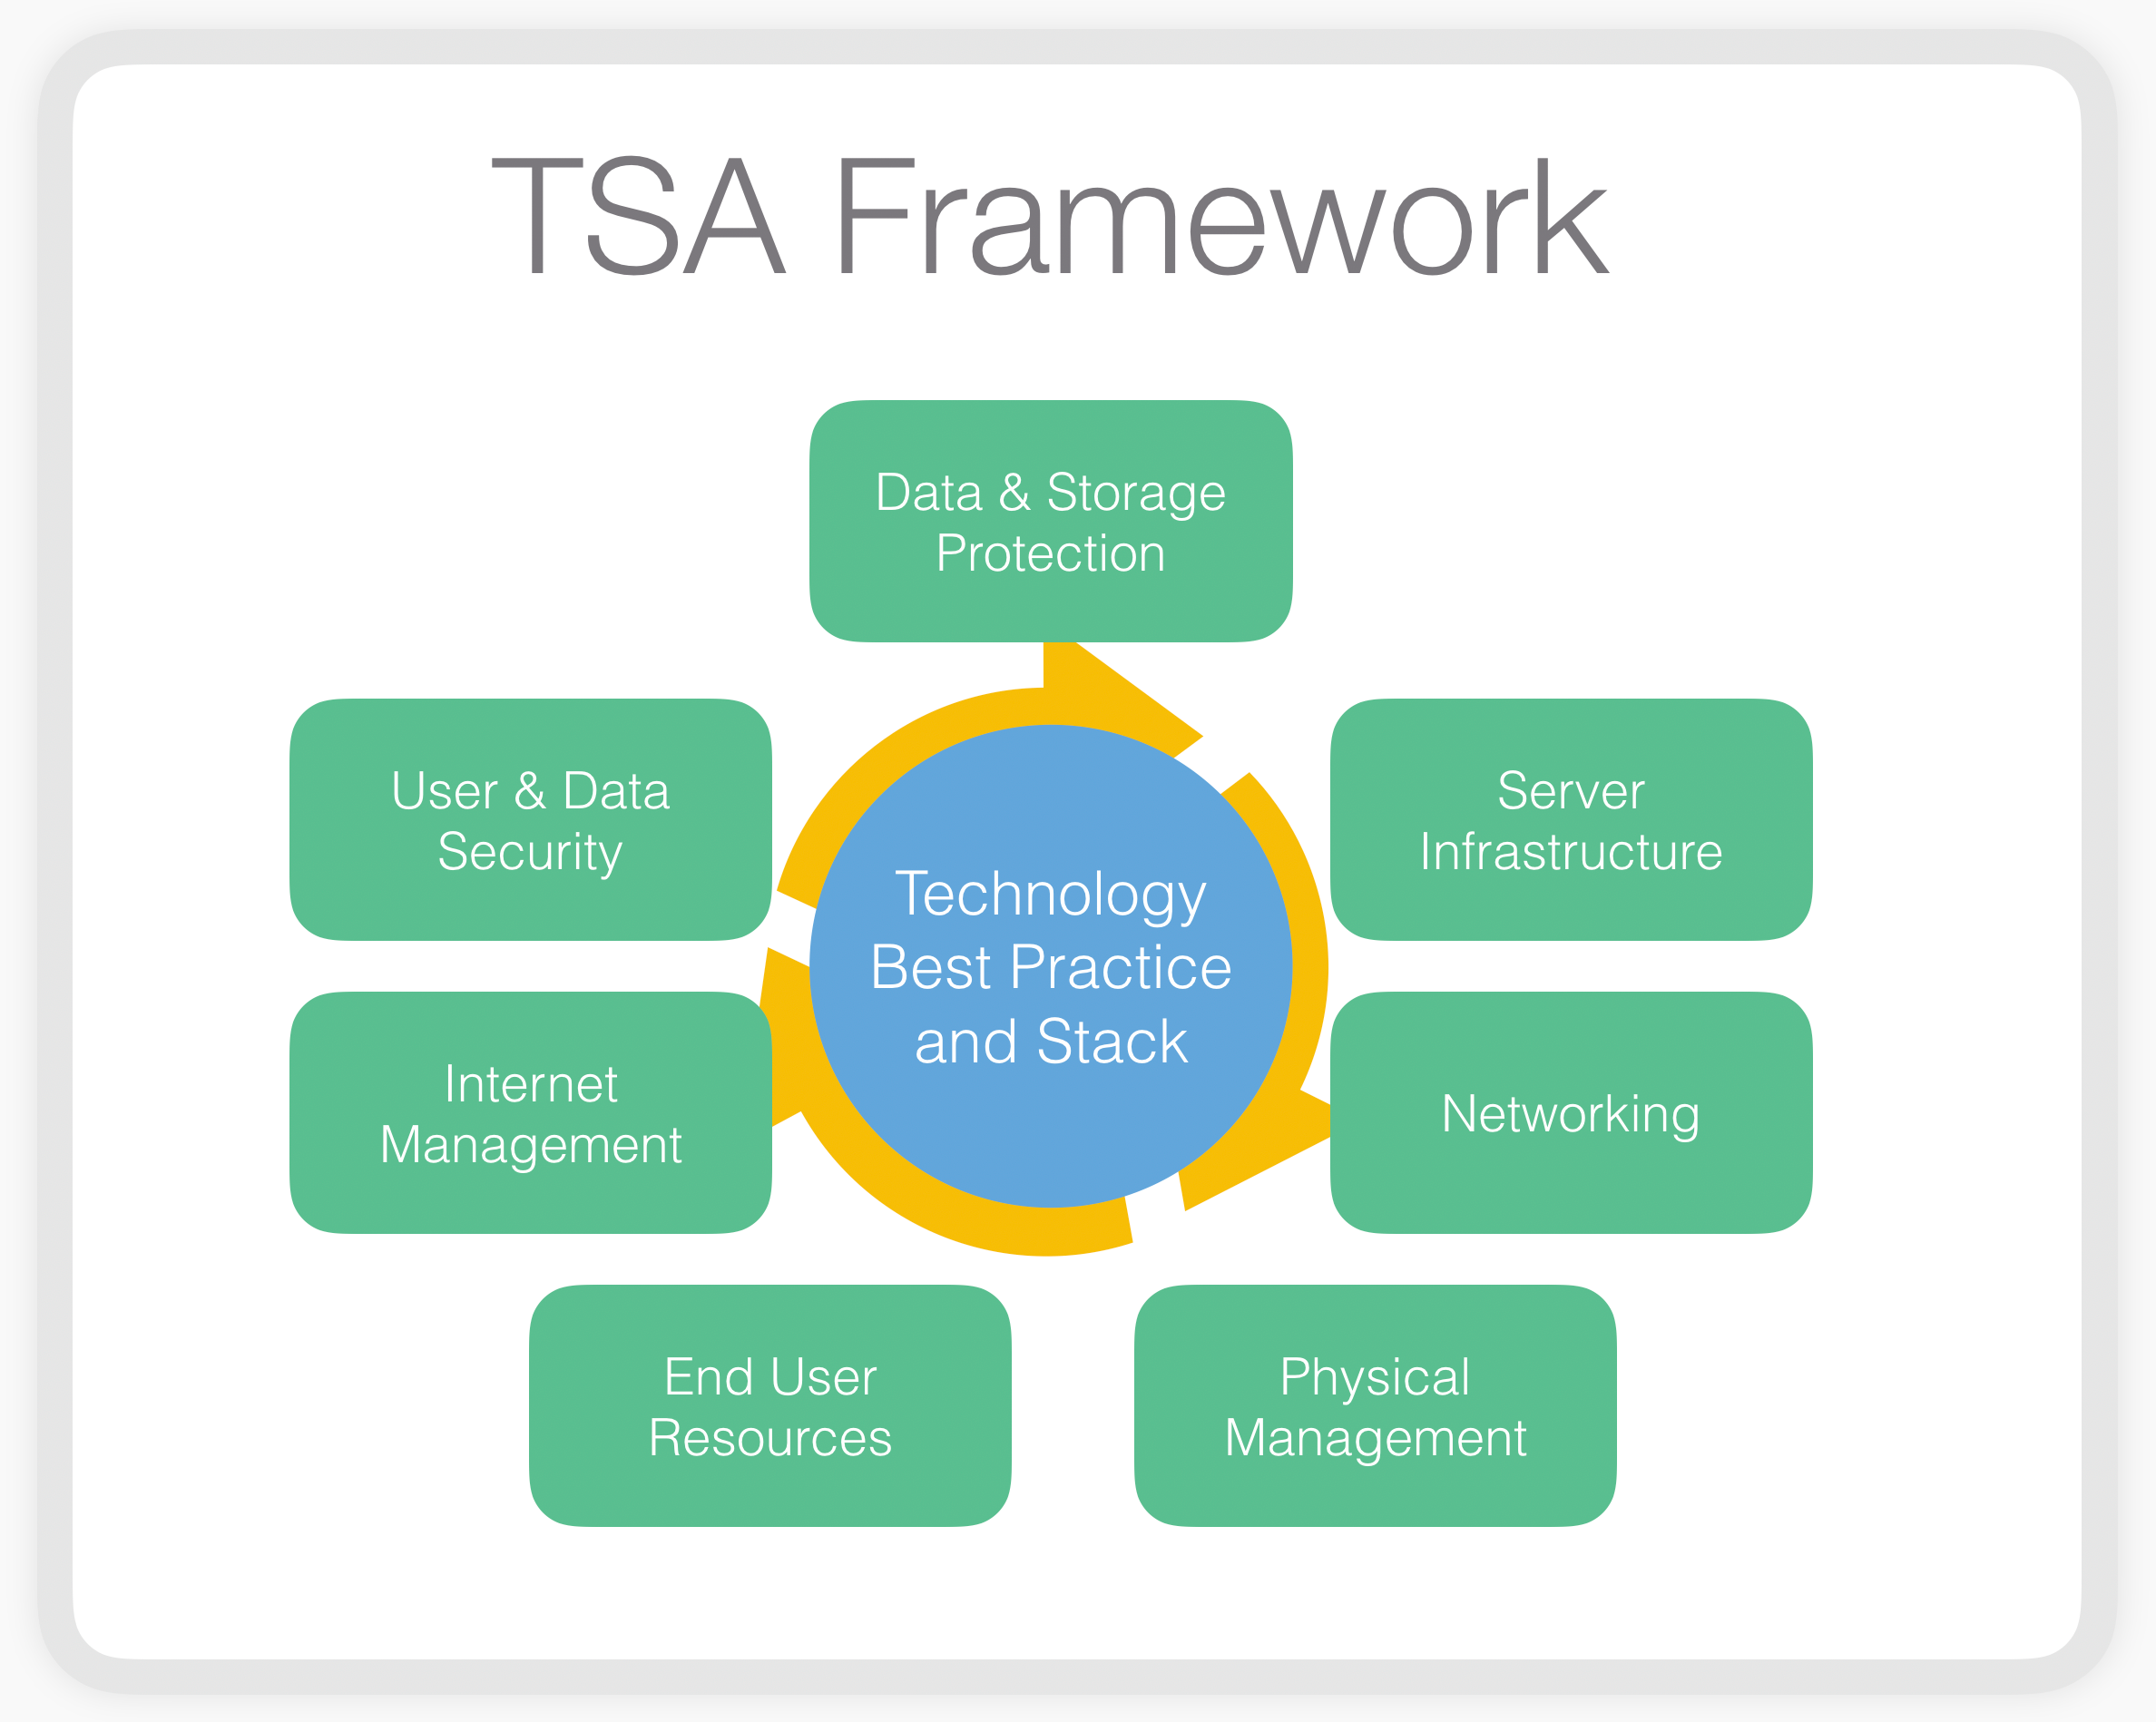 tsa_framework_grey